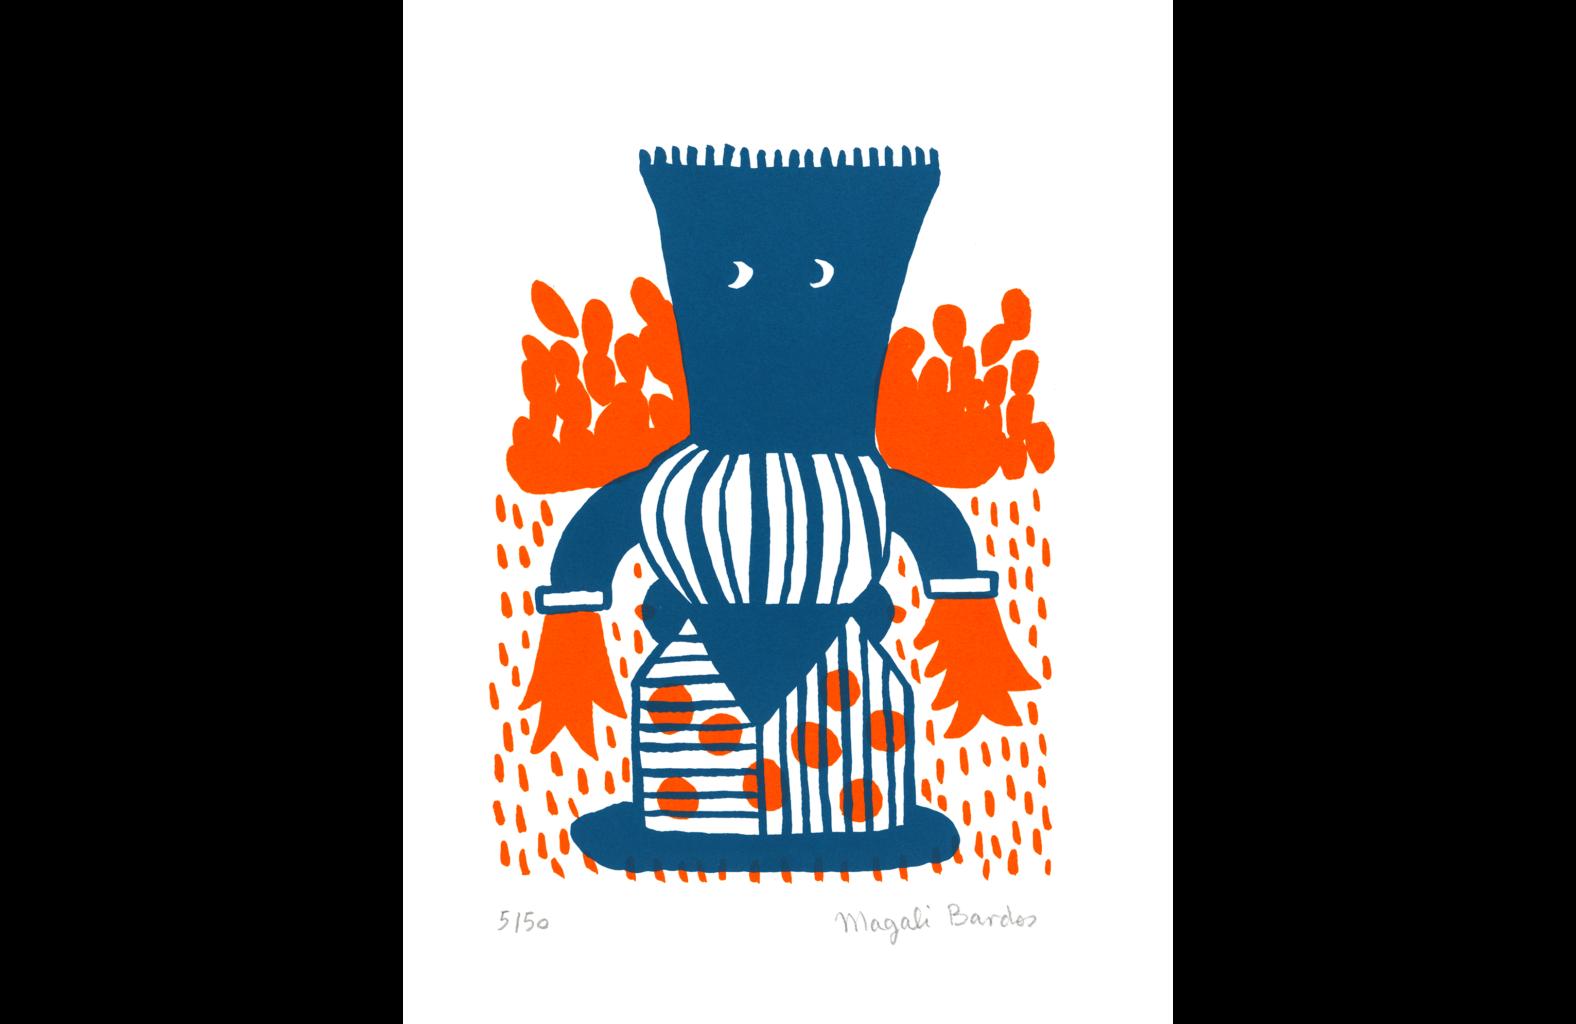 Totem © Magali Bardos sérigraphie silkscreen printing bichromie orange bleu blue affiche poster